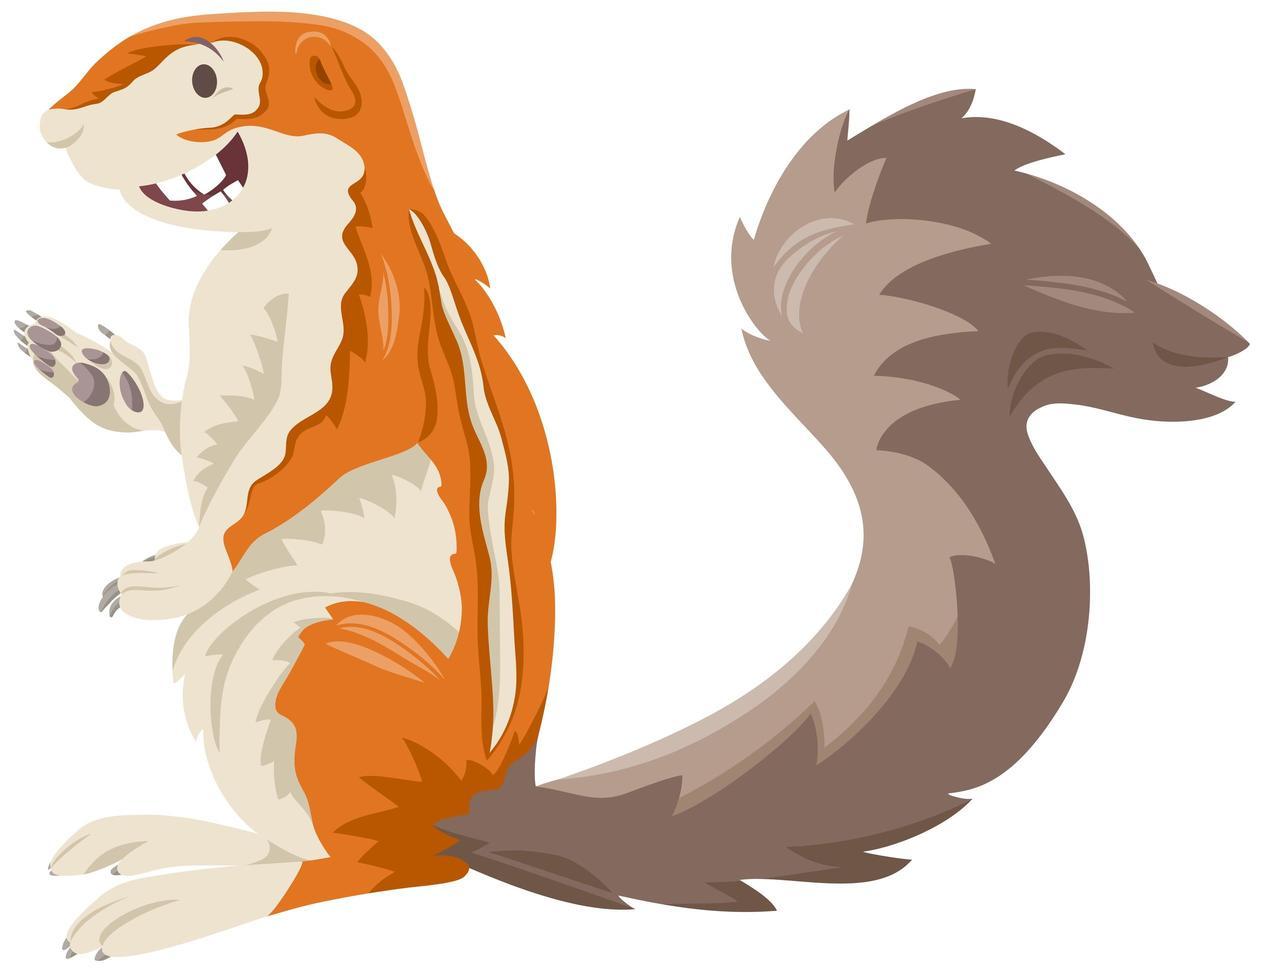 xerus ekorre tecknad vilda djur karaktär vektor